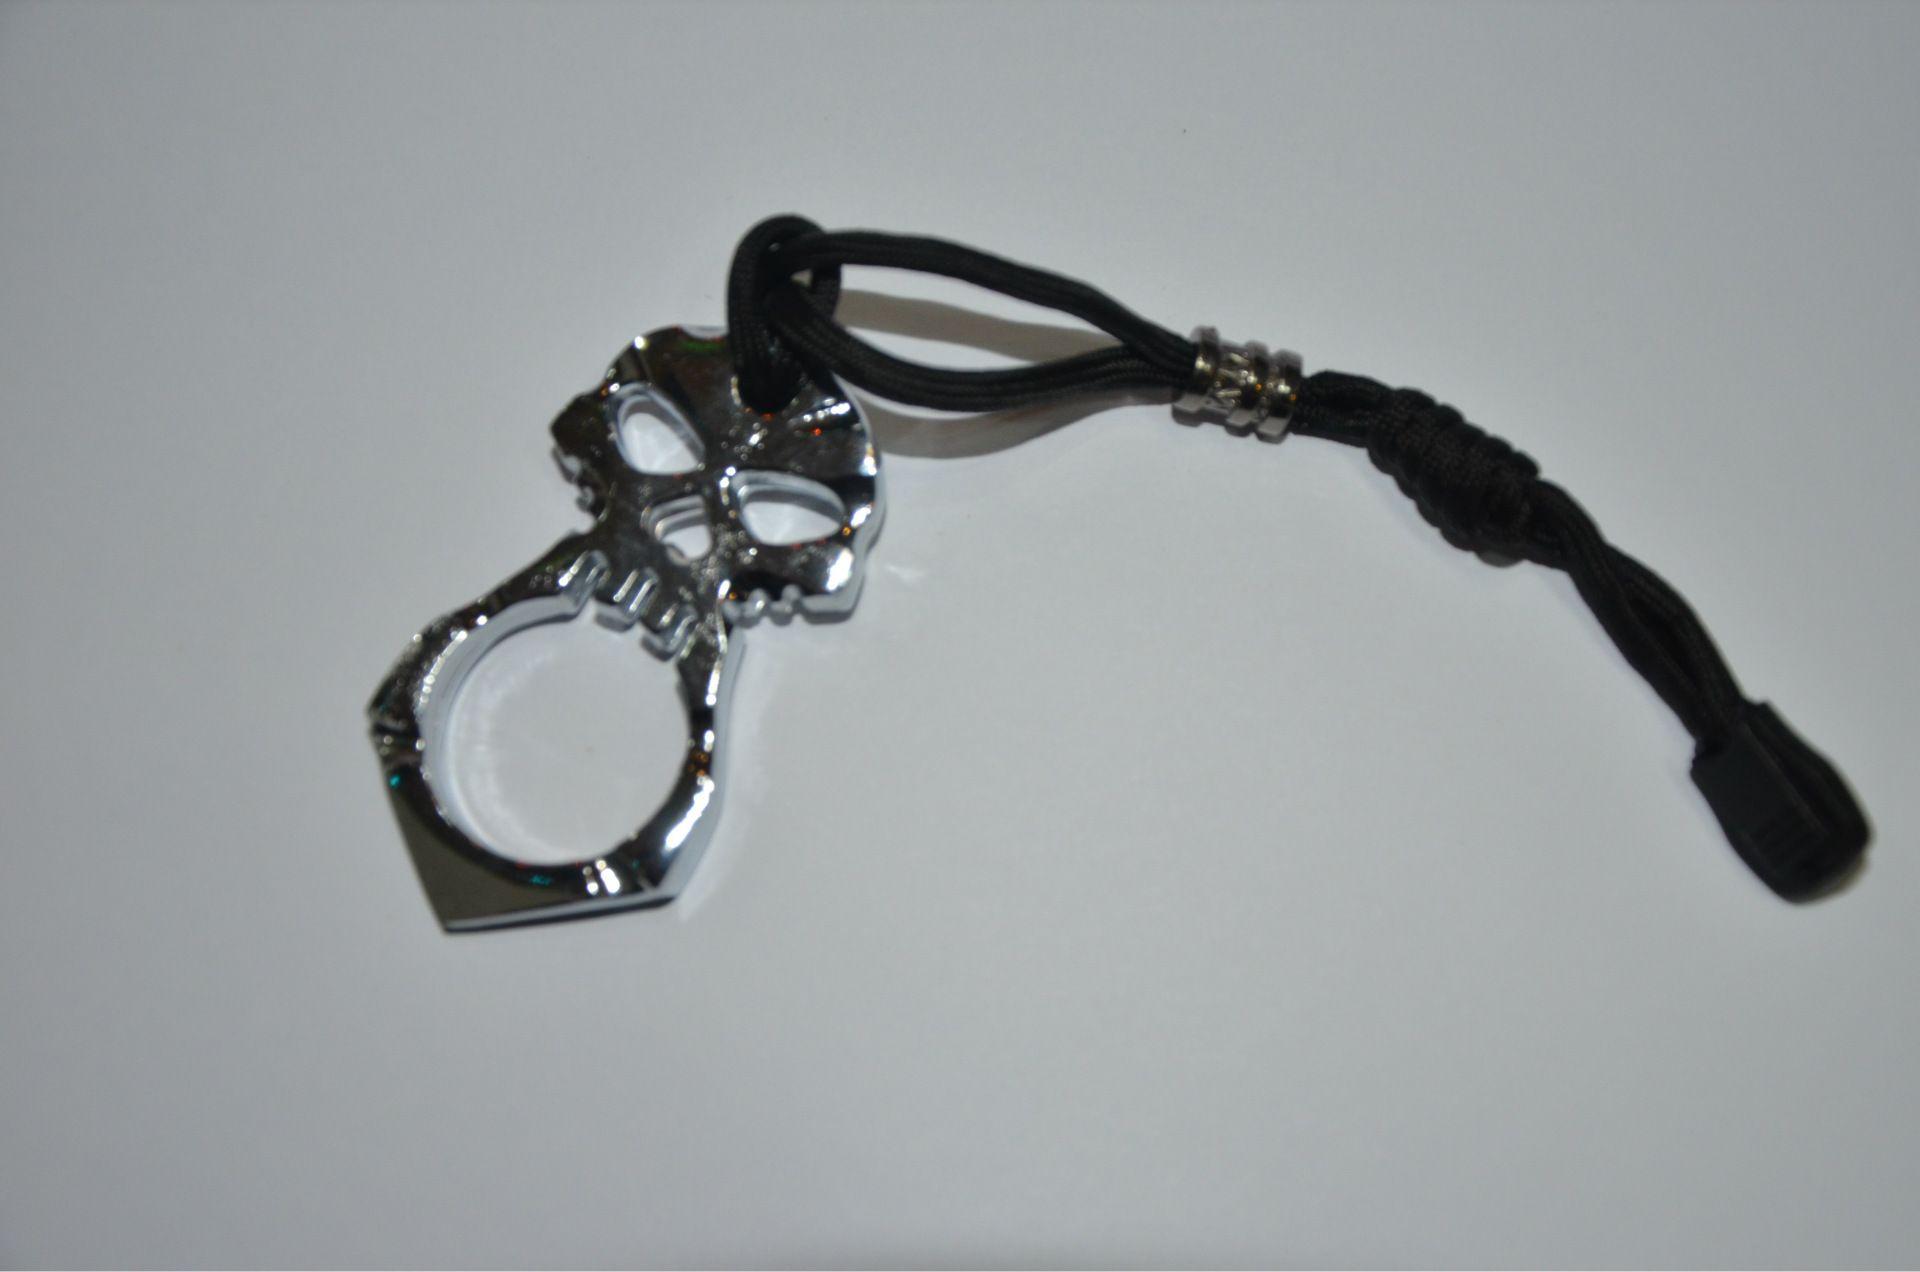 Skull Skeleton single woman Self Defense punch daggers outdoor Buckle Survival pocket Knuck knuckles Multi tools